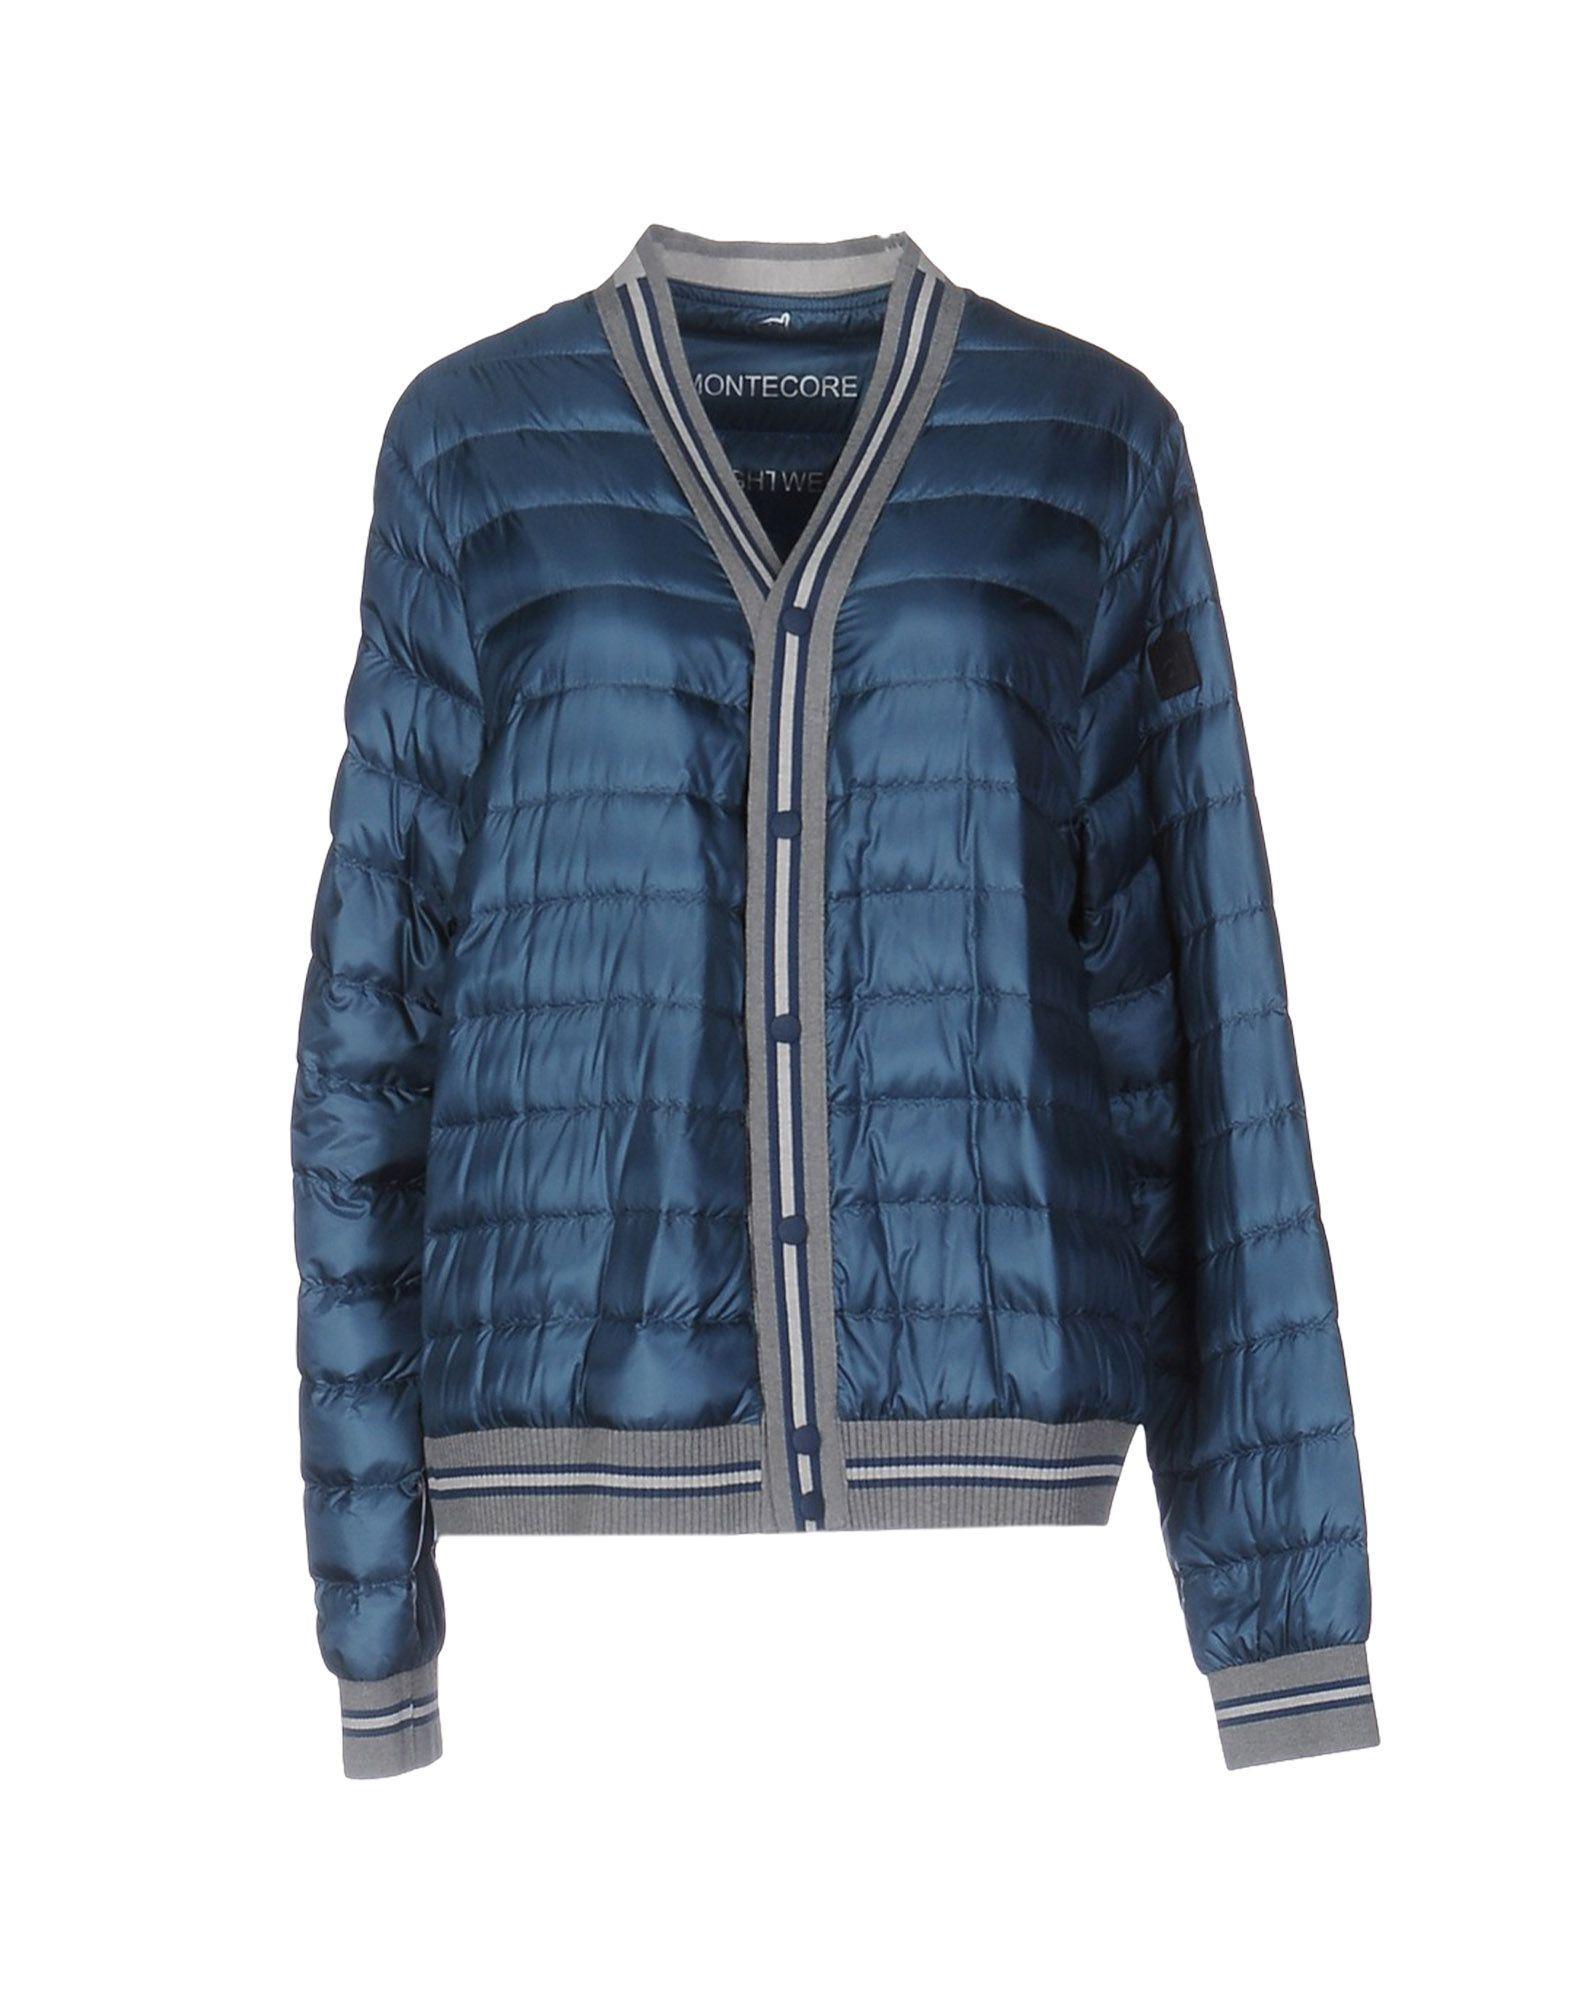 Montecore Down Jackets In Slate Blue